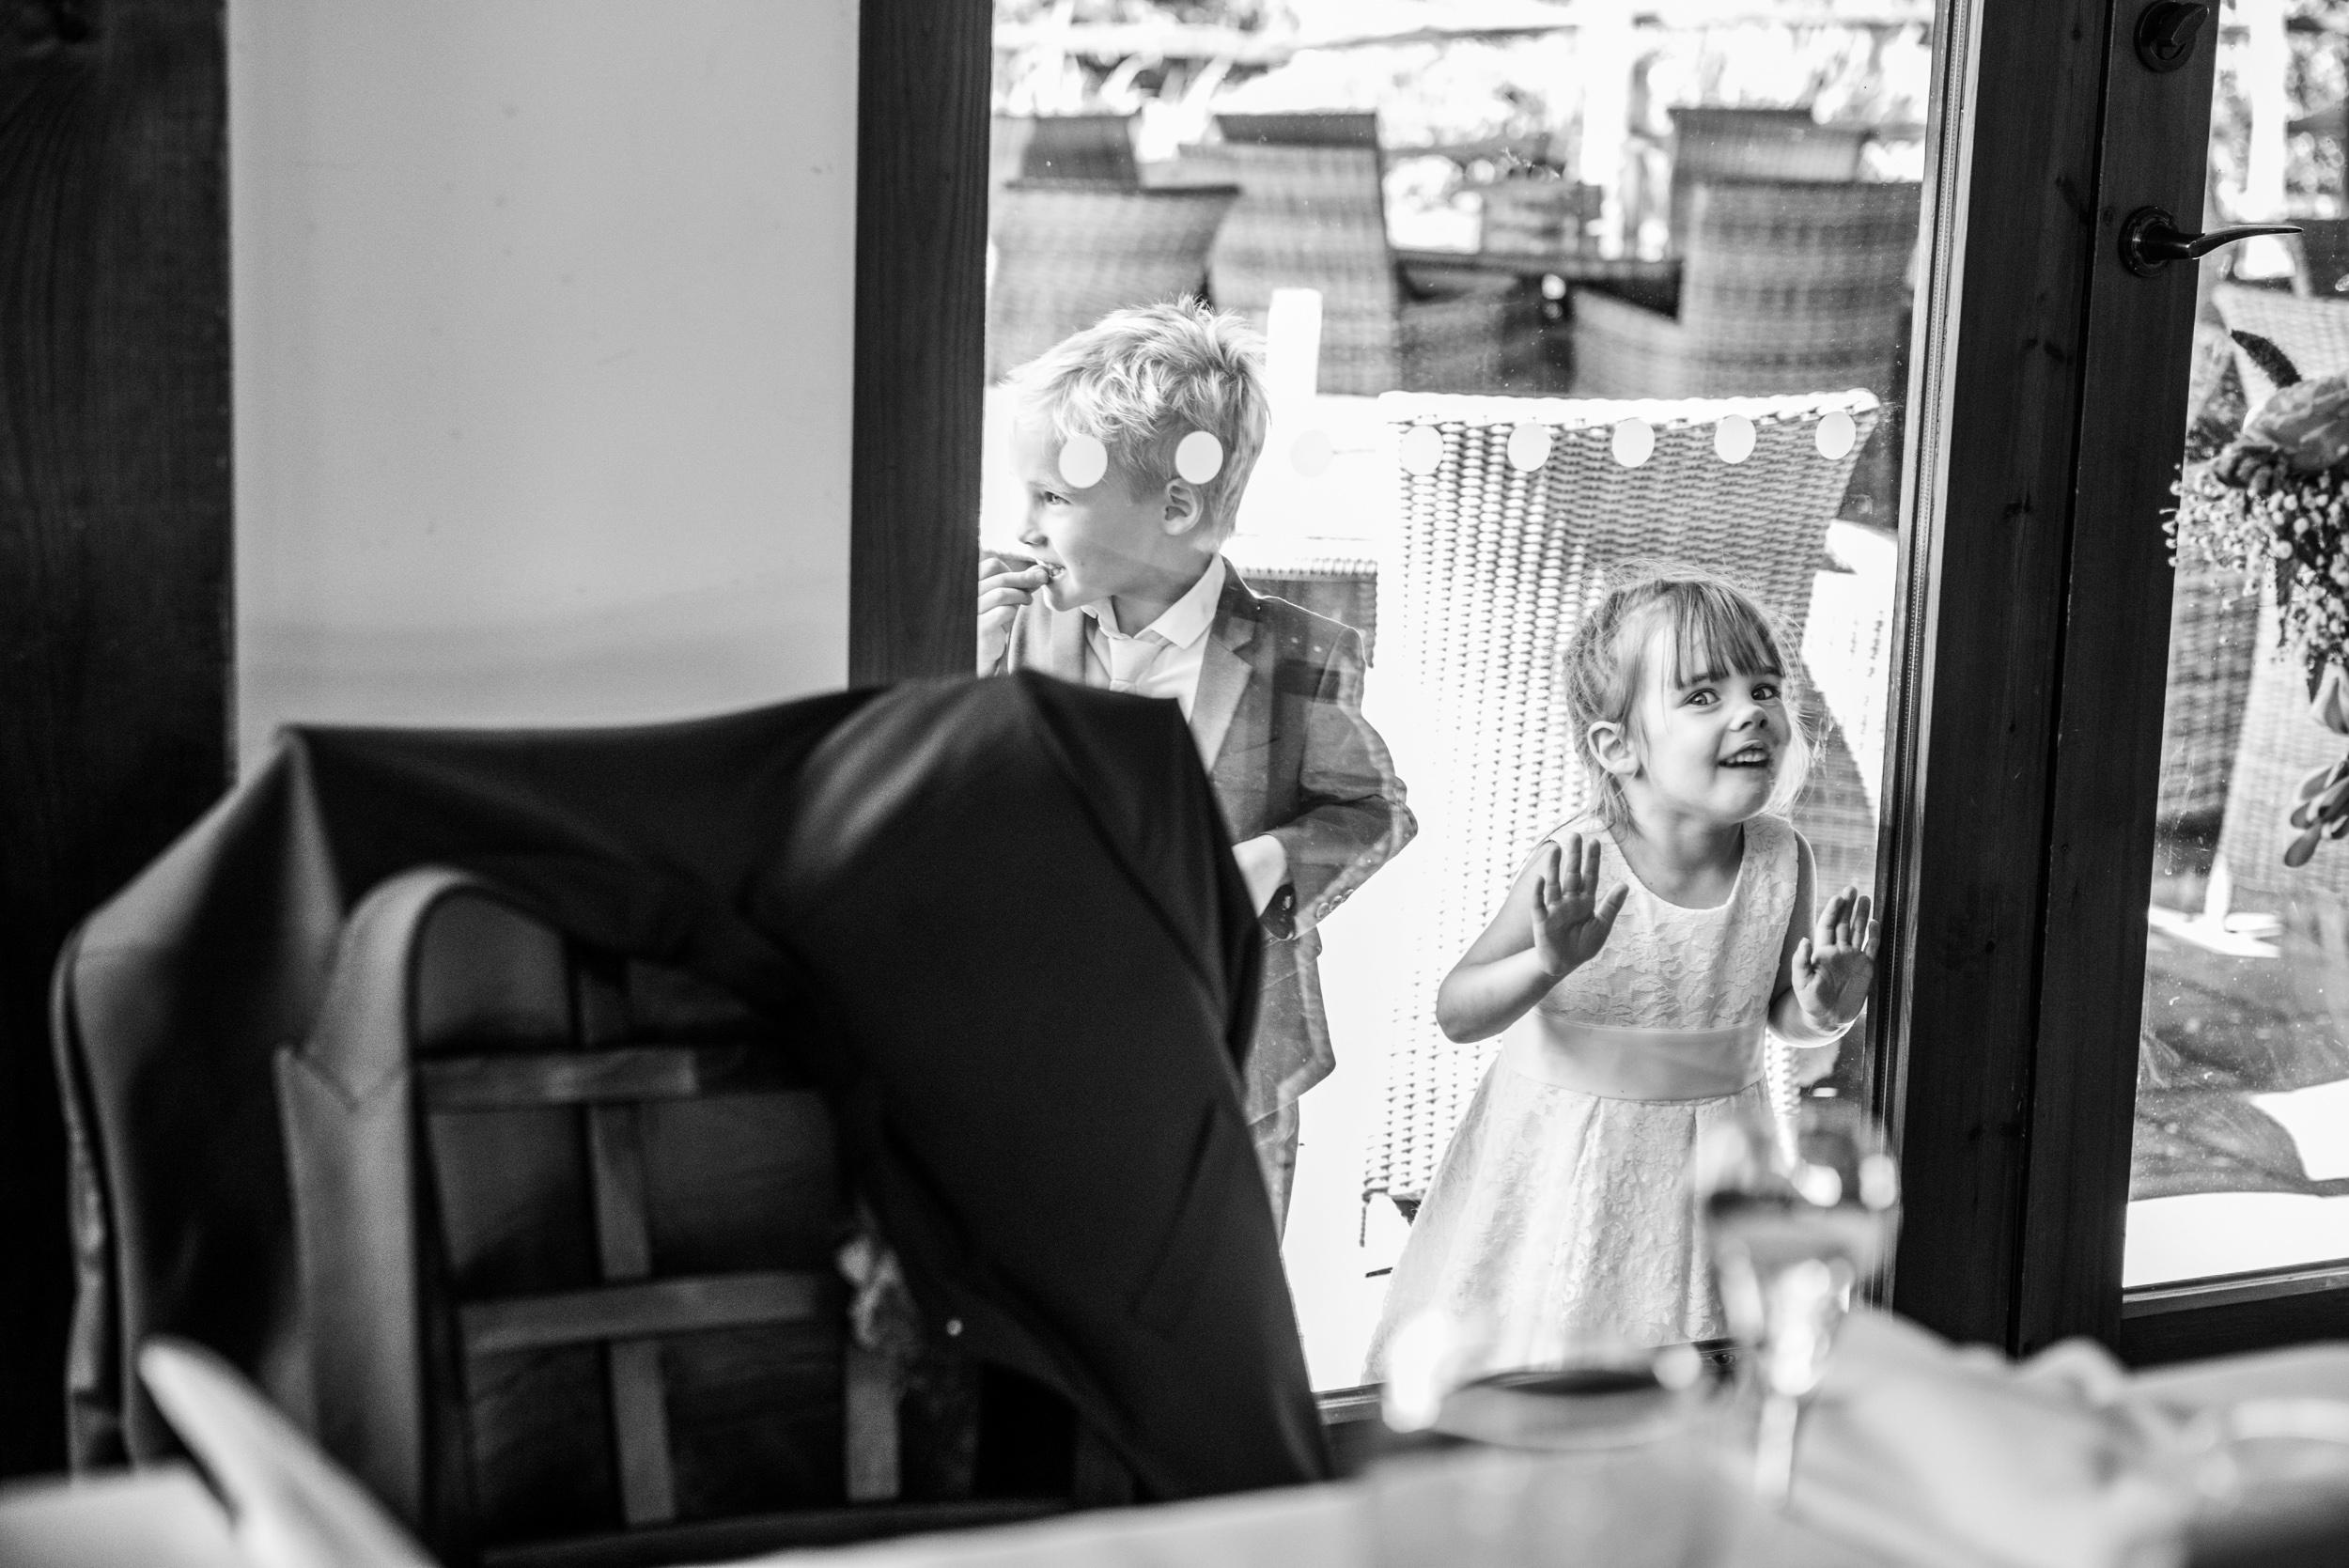 David Scholes Lancashire wedding photography 2016-137.jpg